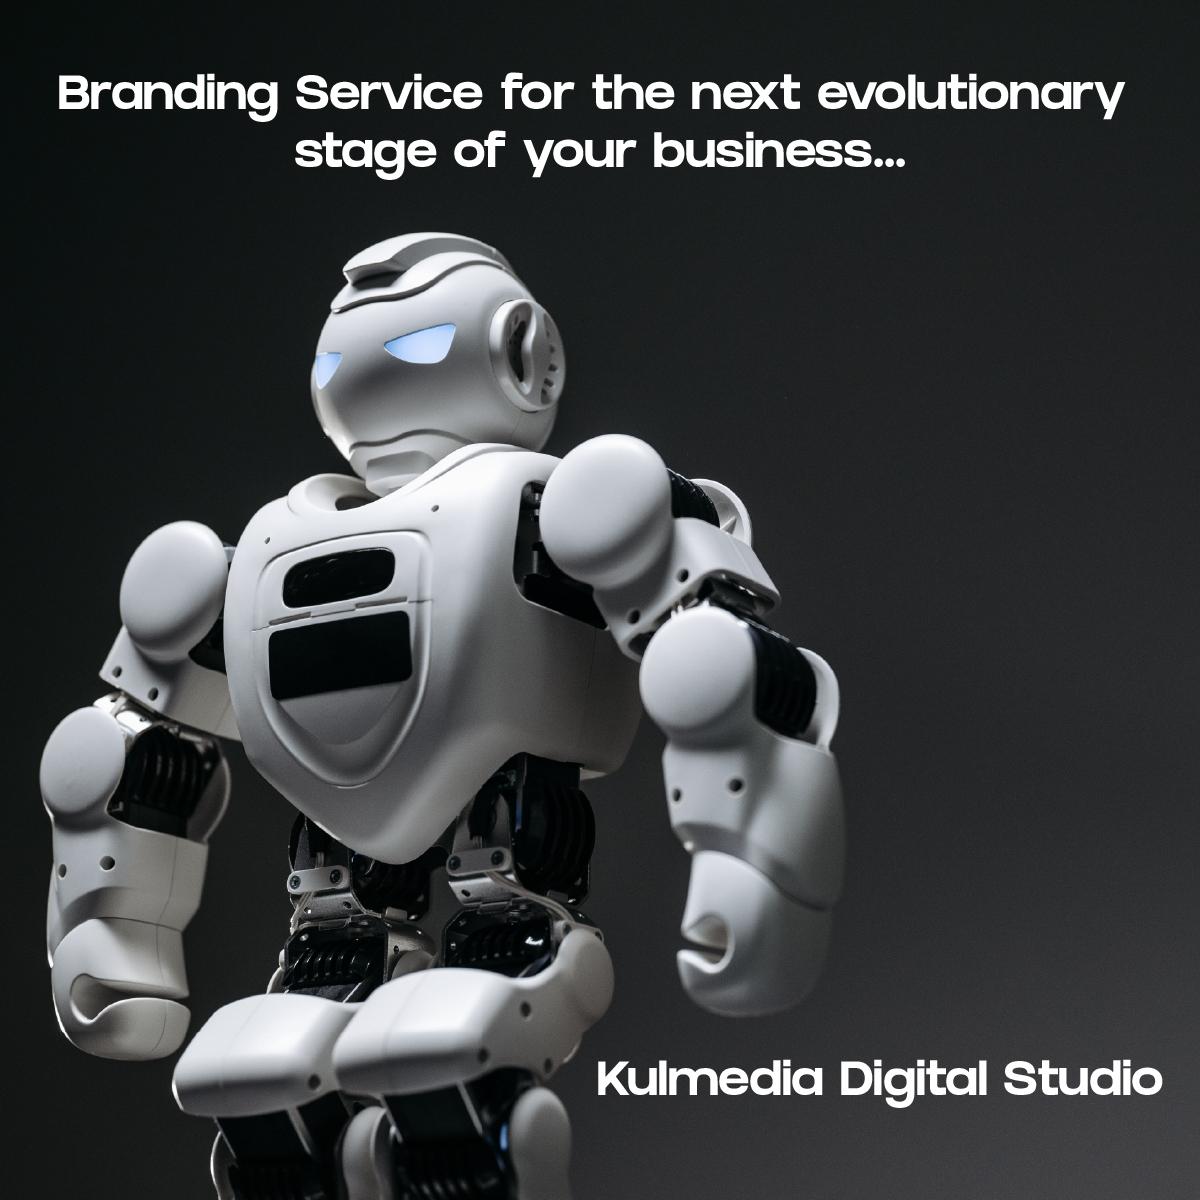 Branding Service by Kulmedia Digital Studio